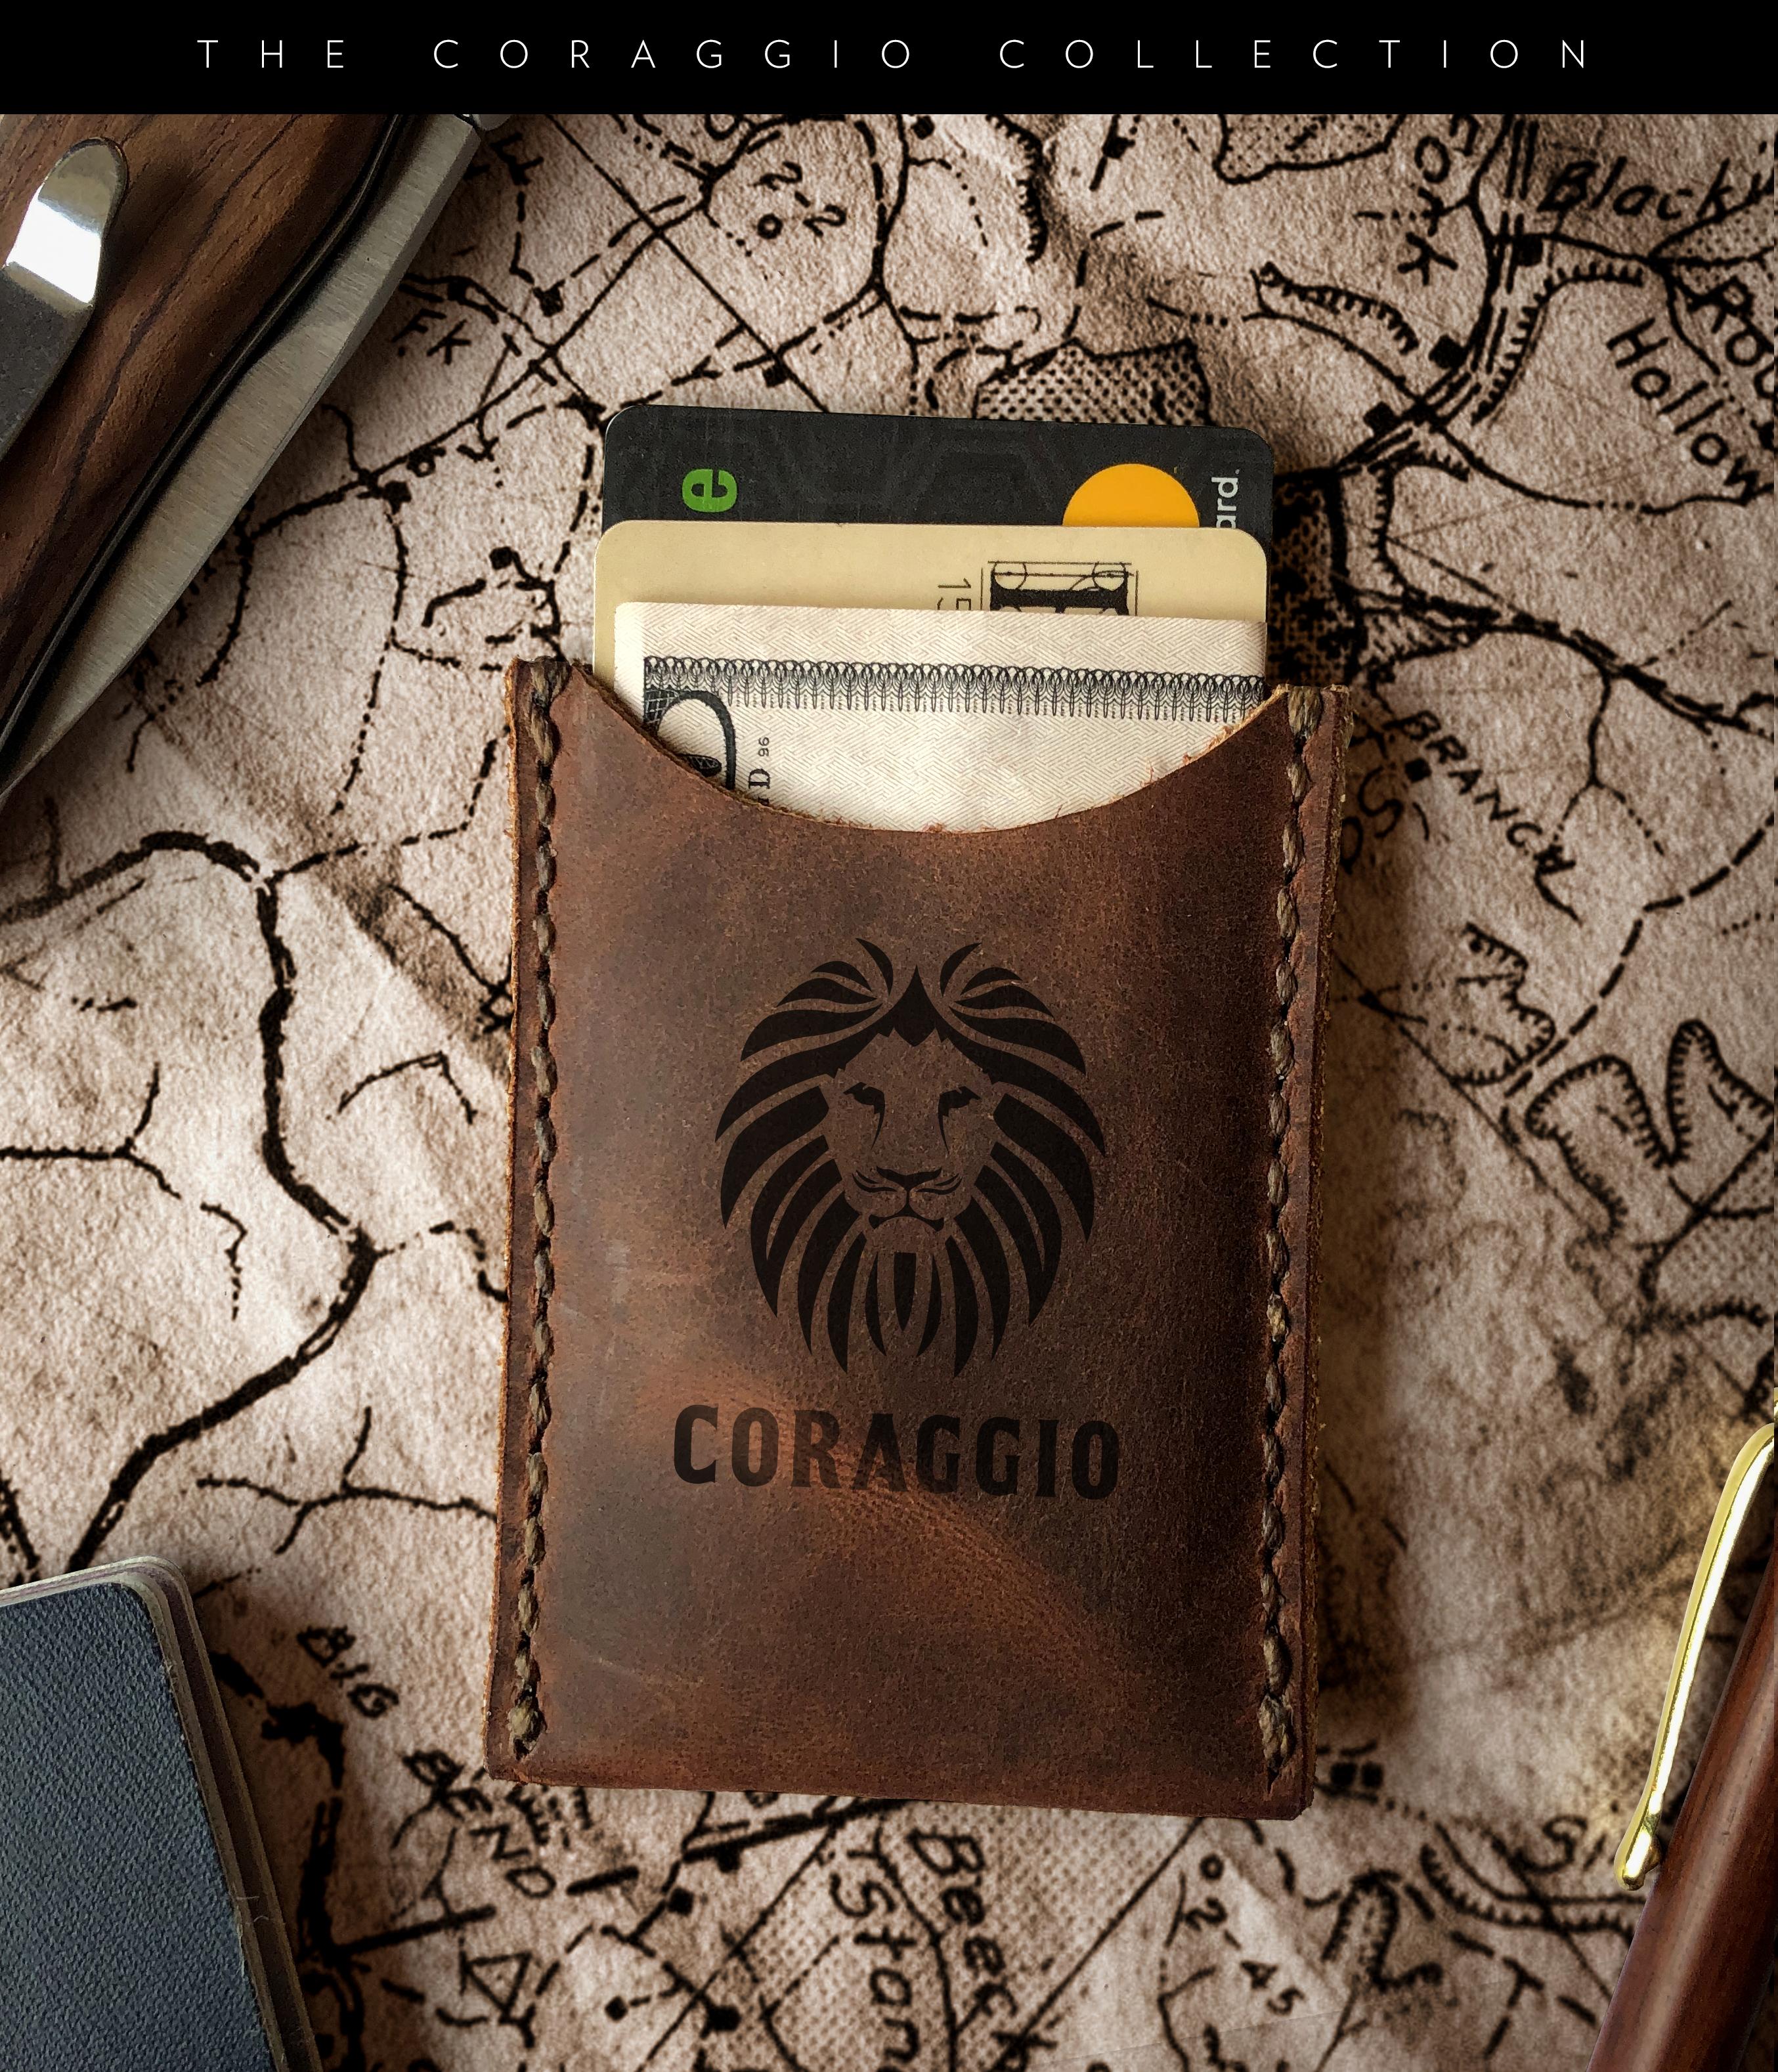 card-holder-with-logo.jpg